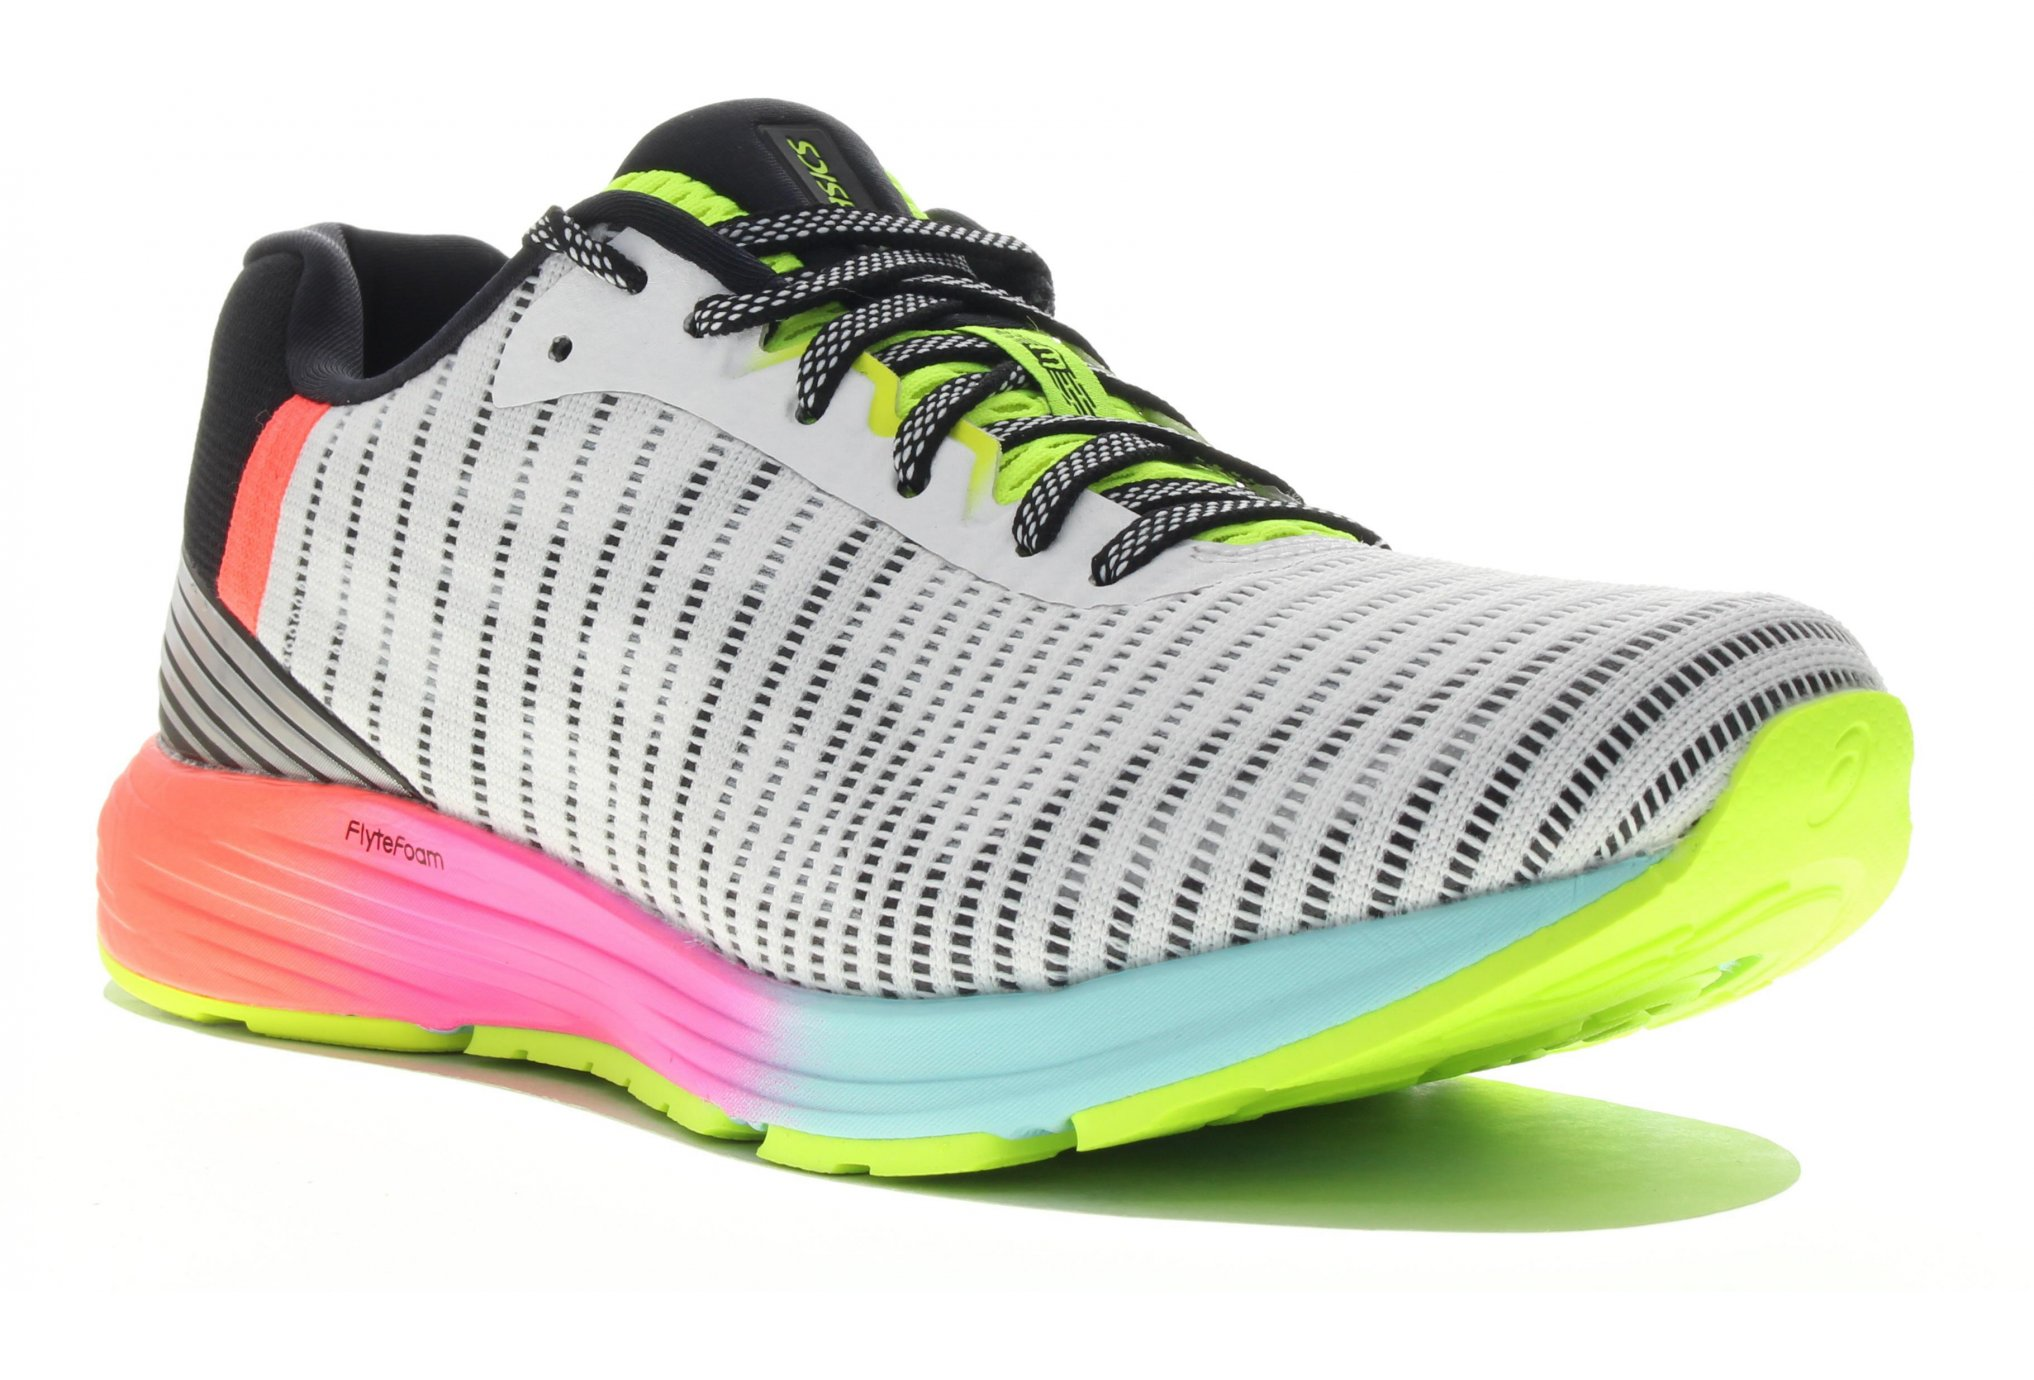 Asics Dynaflyte 3 SP Chaussures running femme